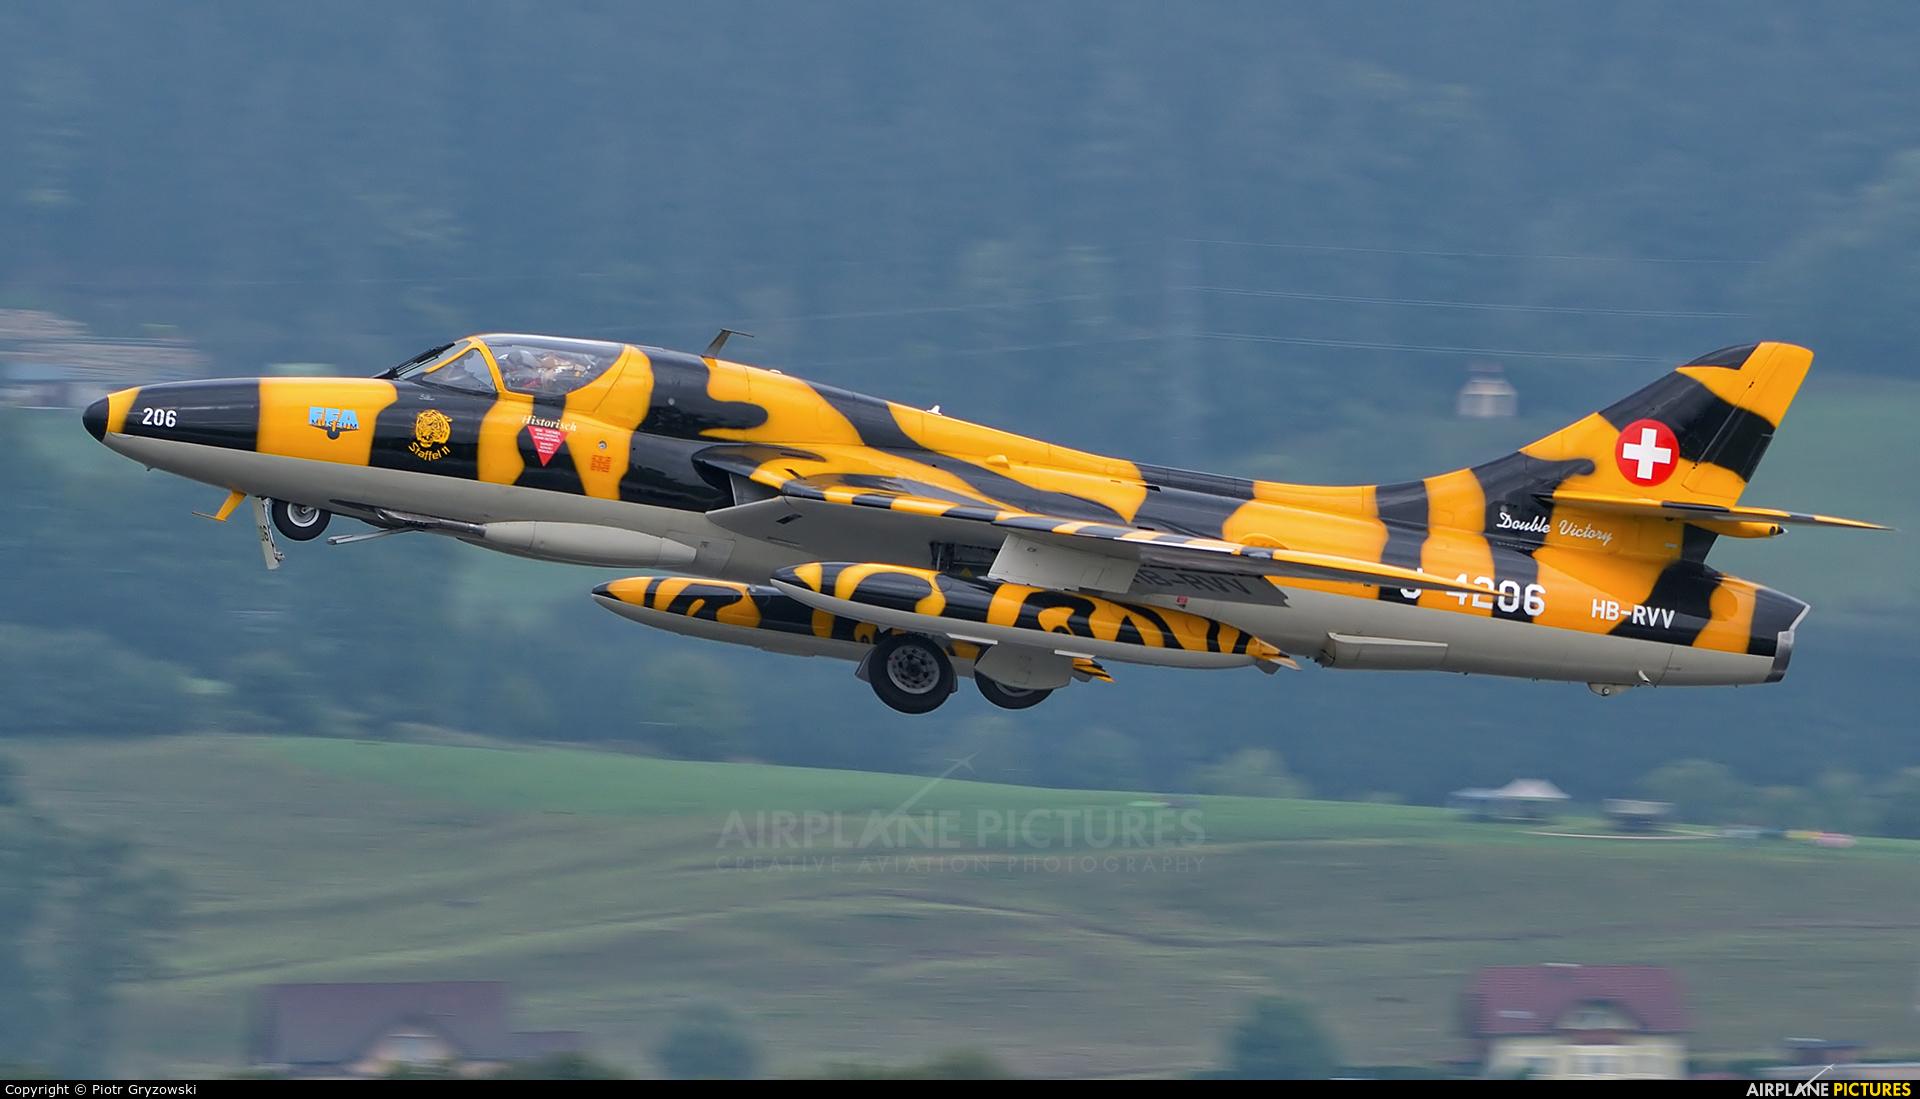 FFA Museum HB-RVV aircraft at Zeltweg